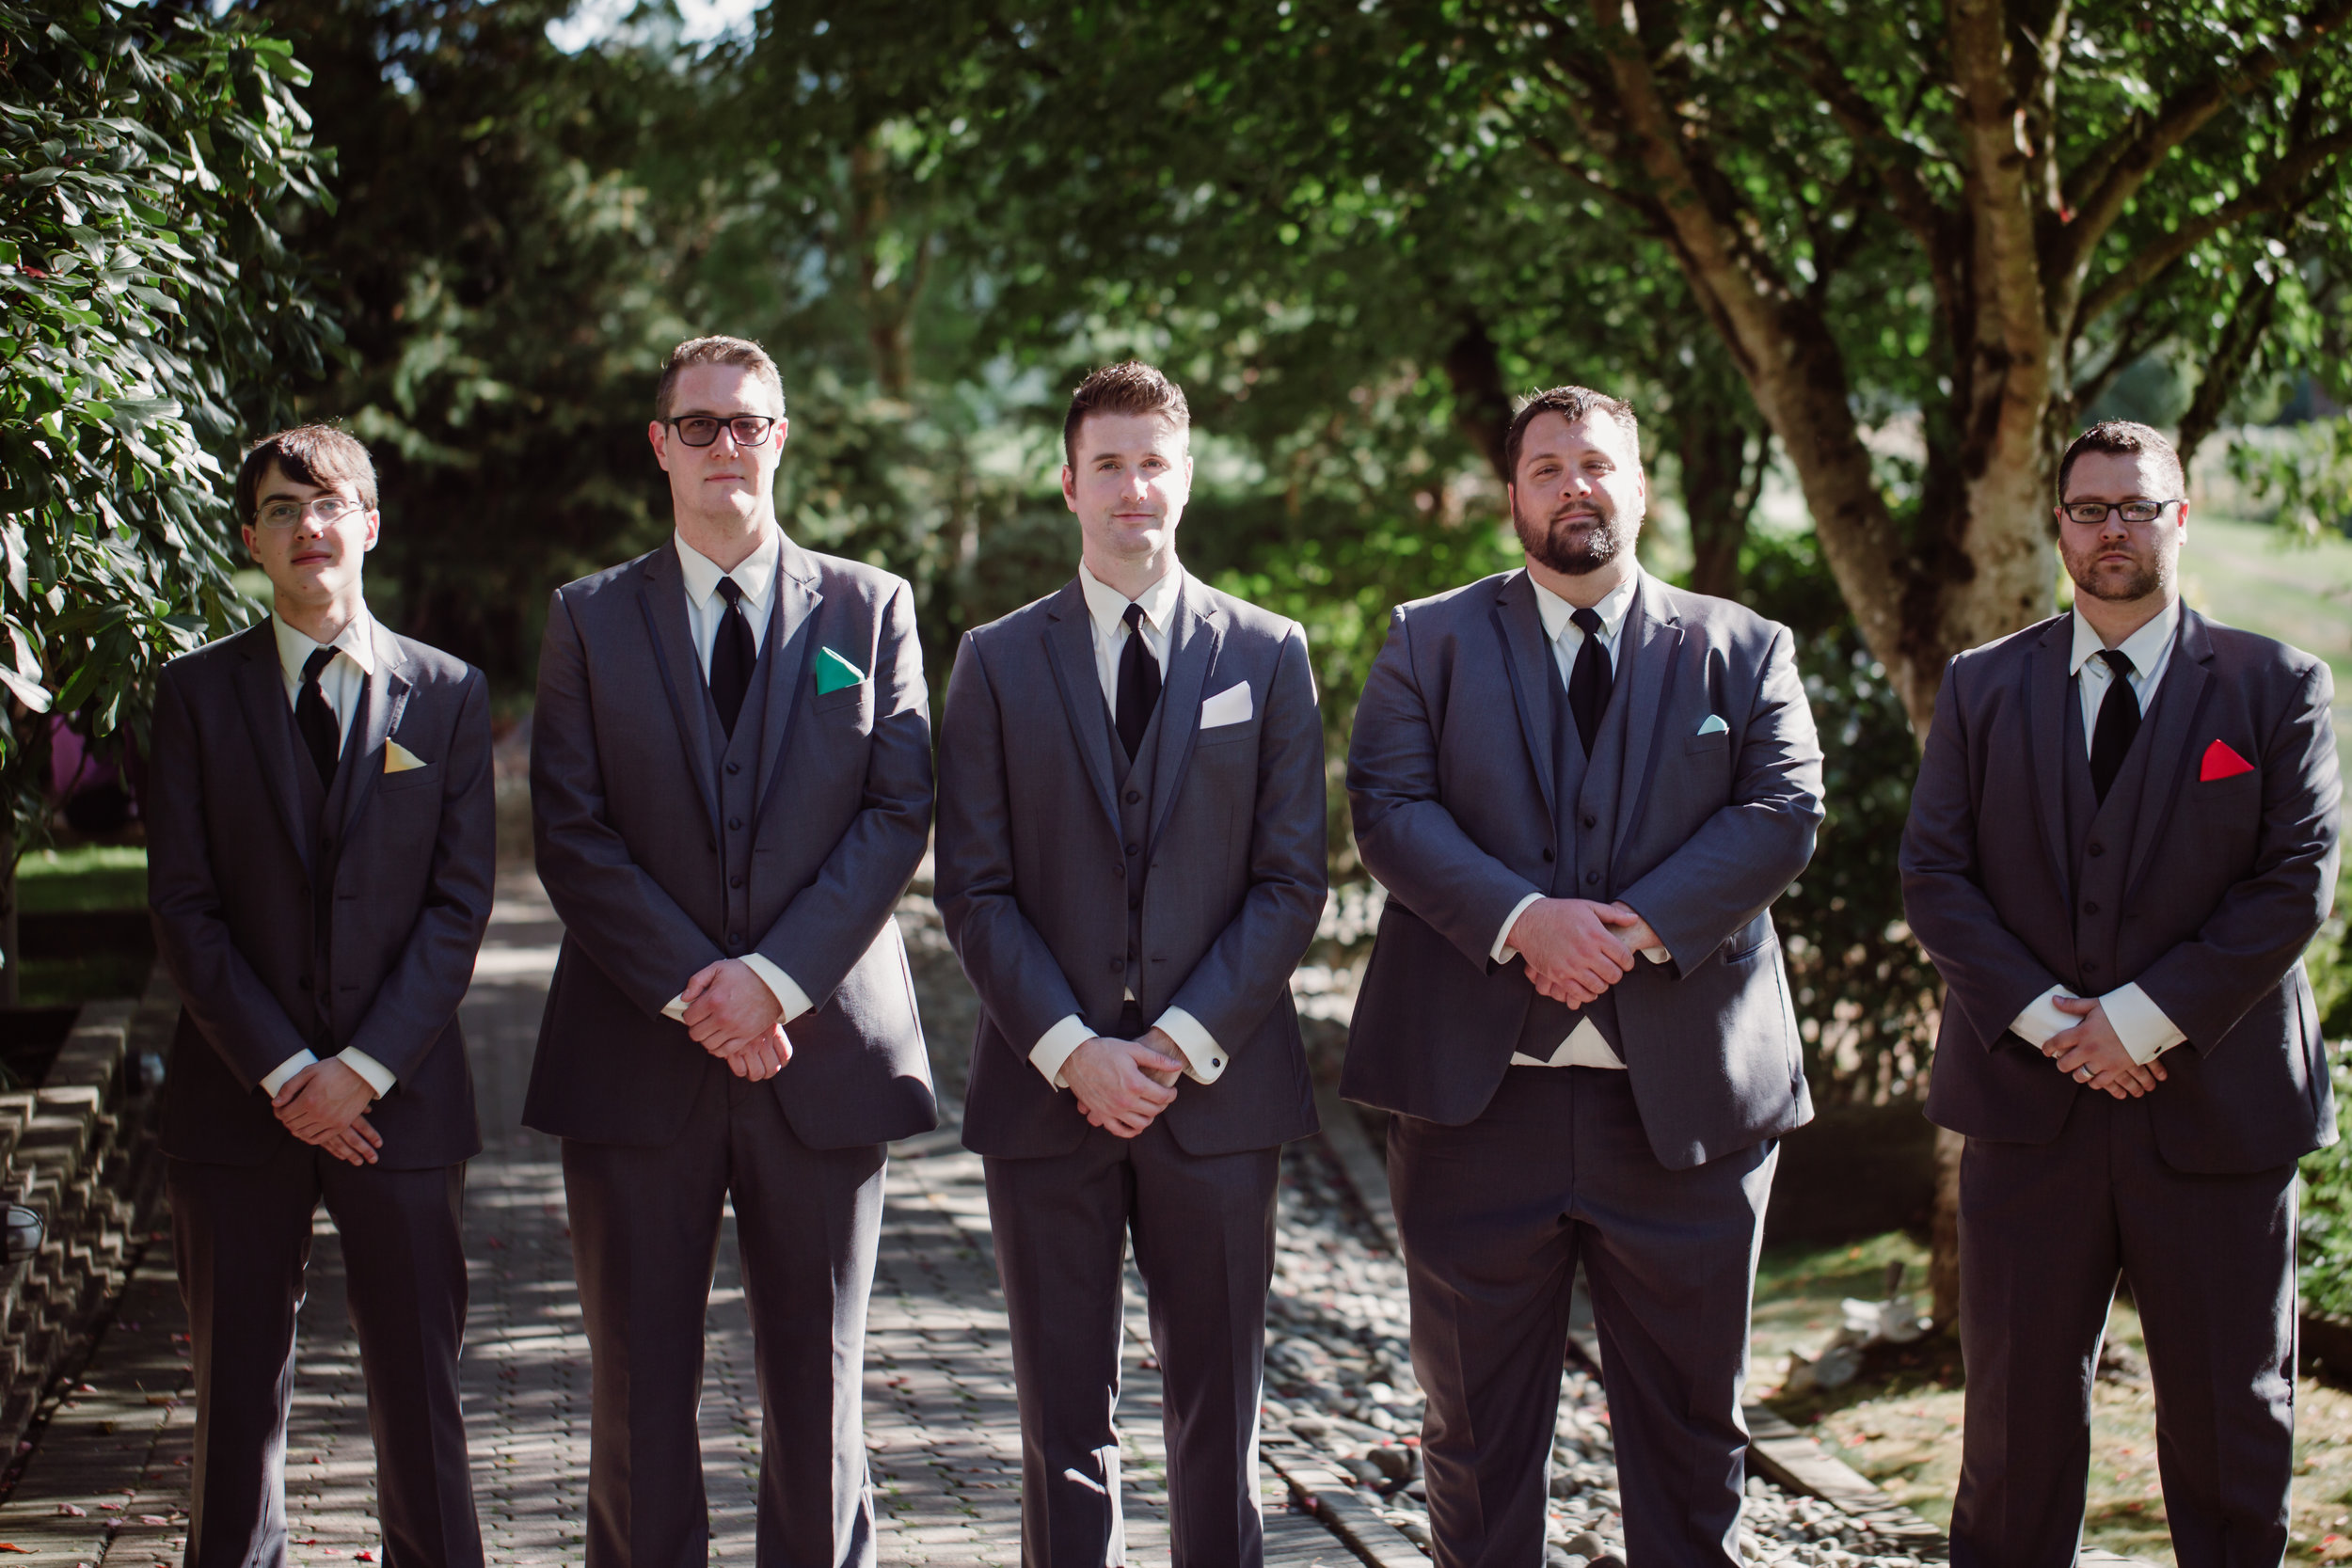 Coyote-Creek-Golf-Club-Wedding-Vancouver